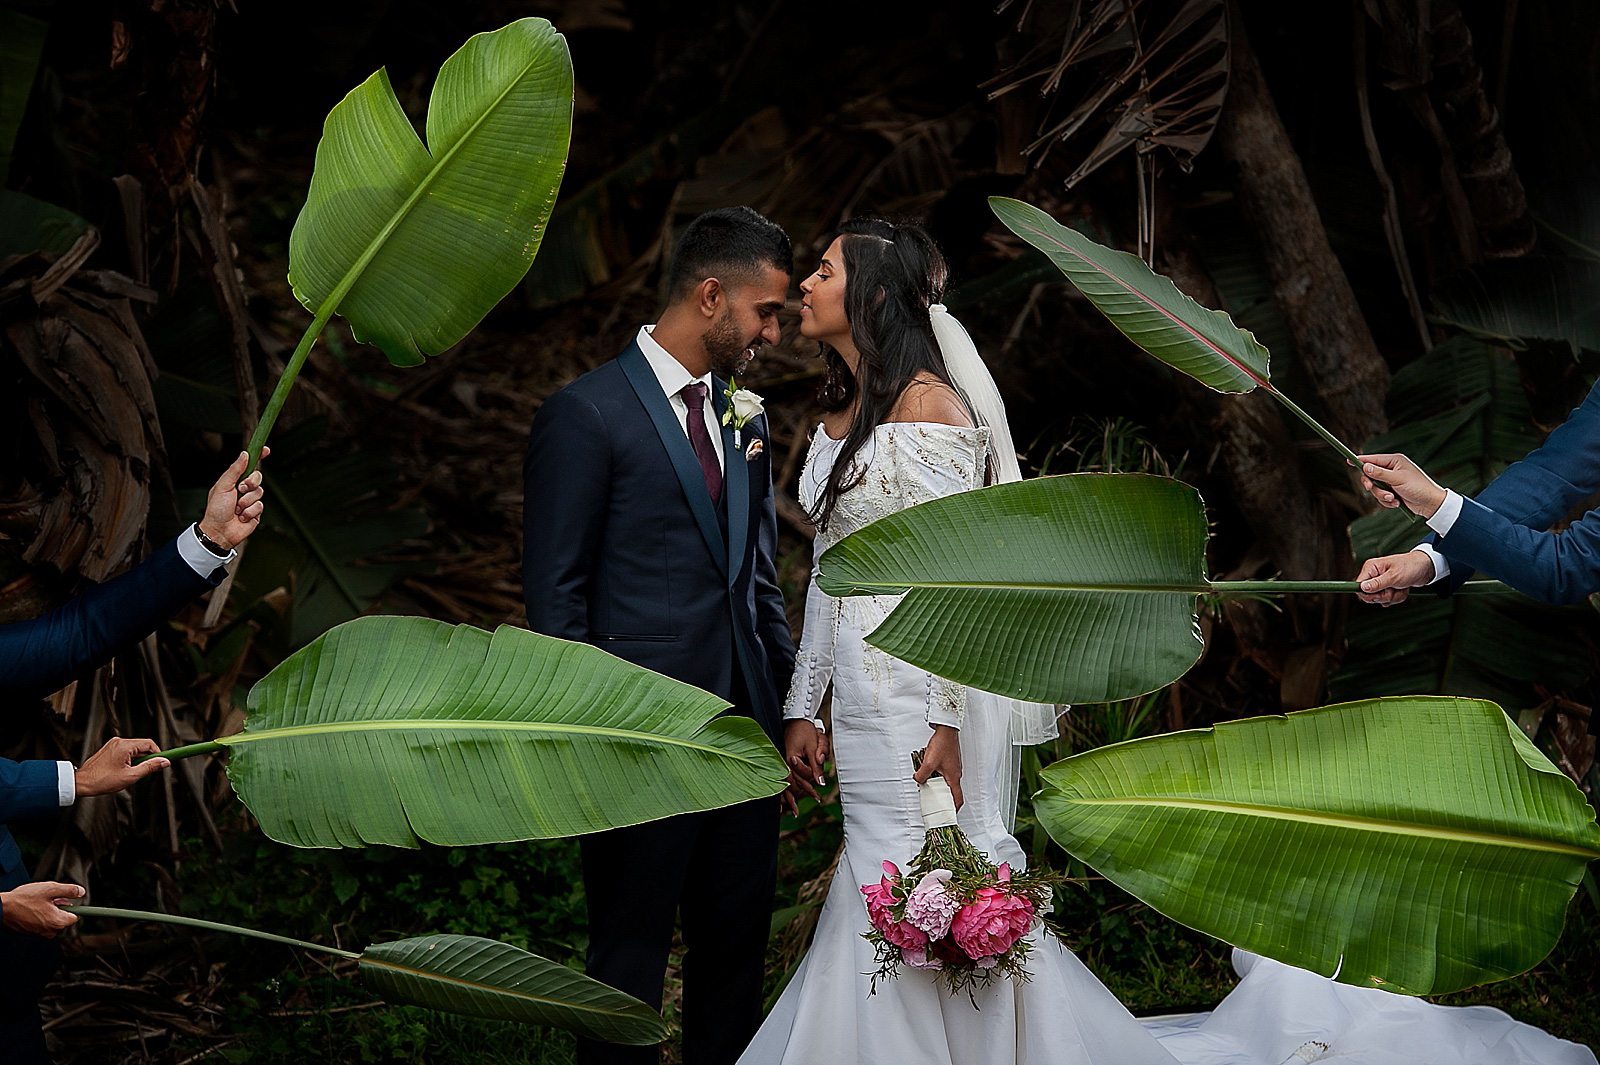 Destination wedding at Zimbali South Africa photographed by top South African wedding photographer Jacki Bruniquel